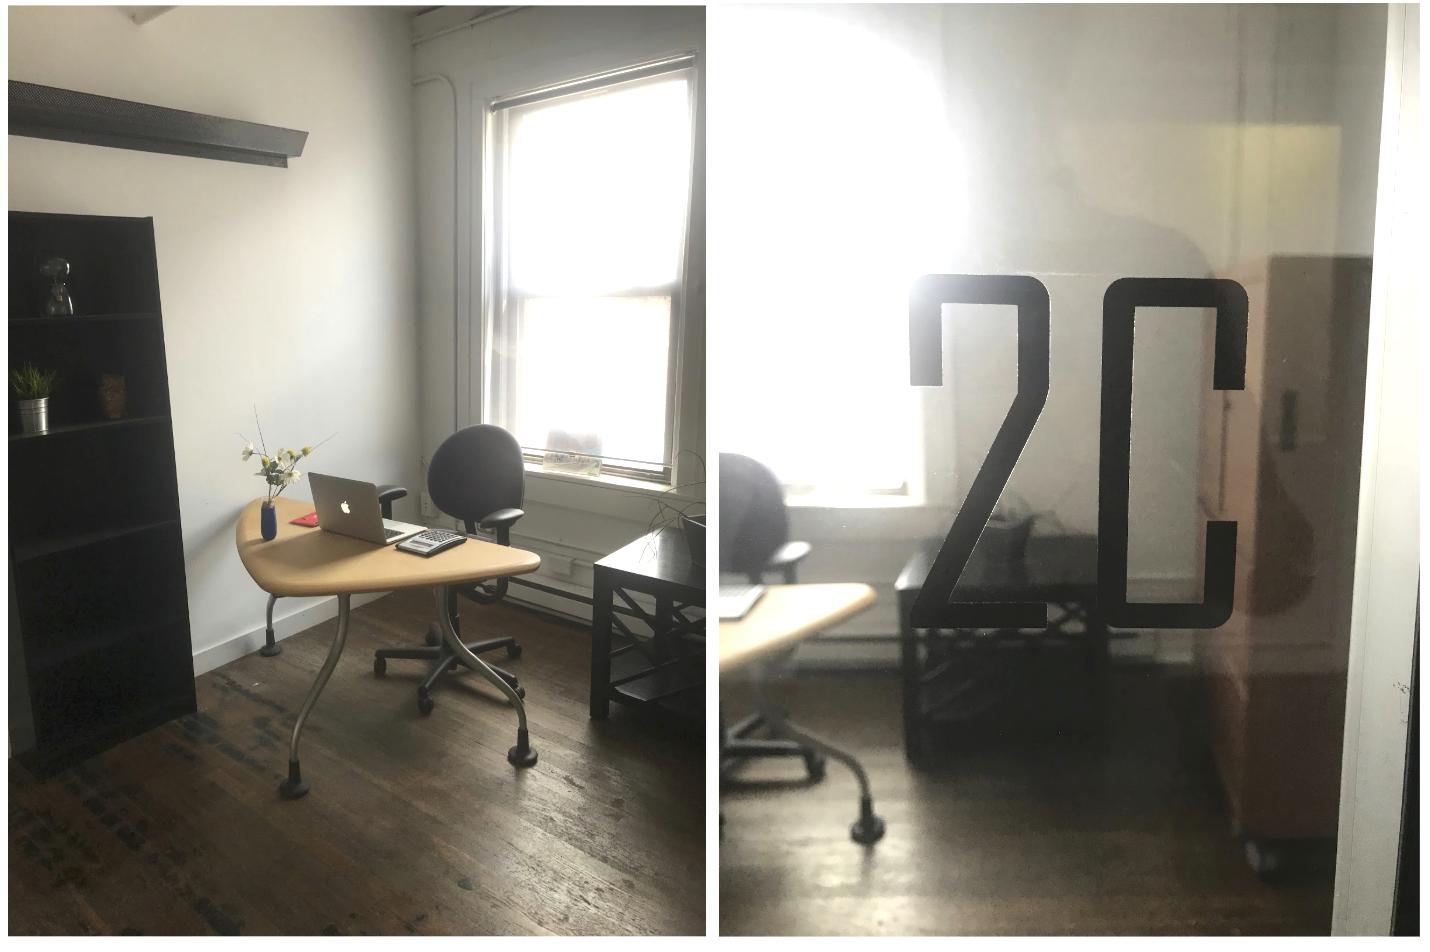 Office 2C - Price: $500/month